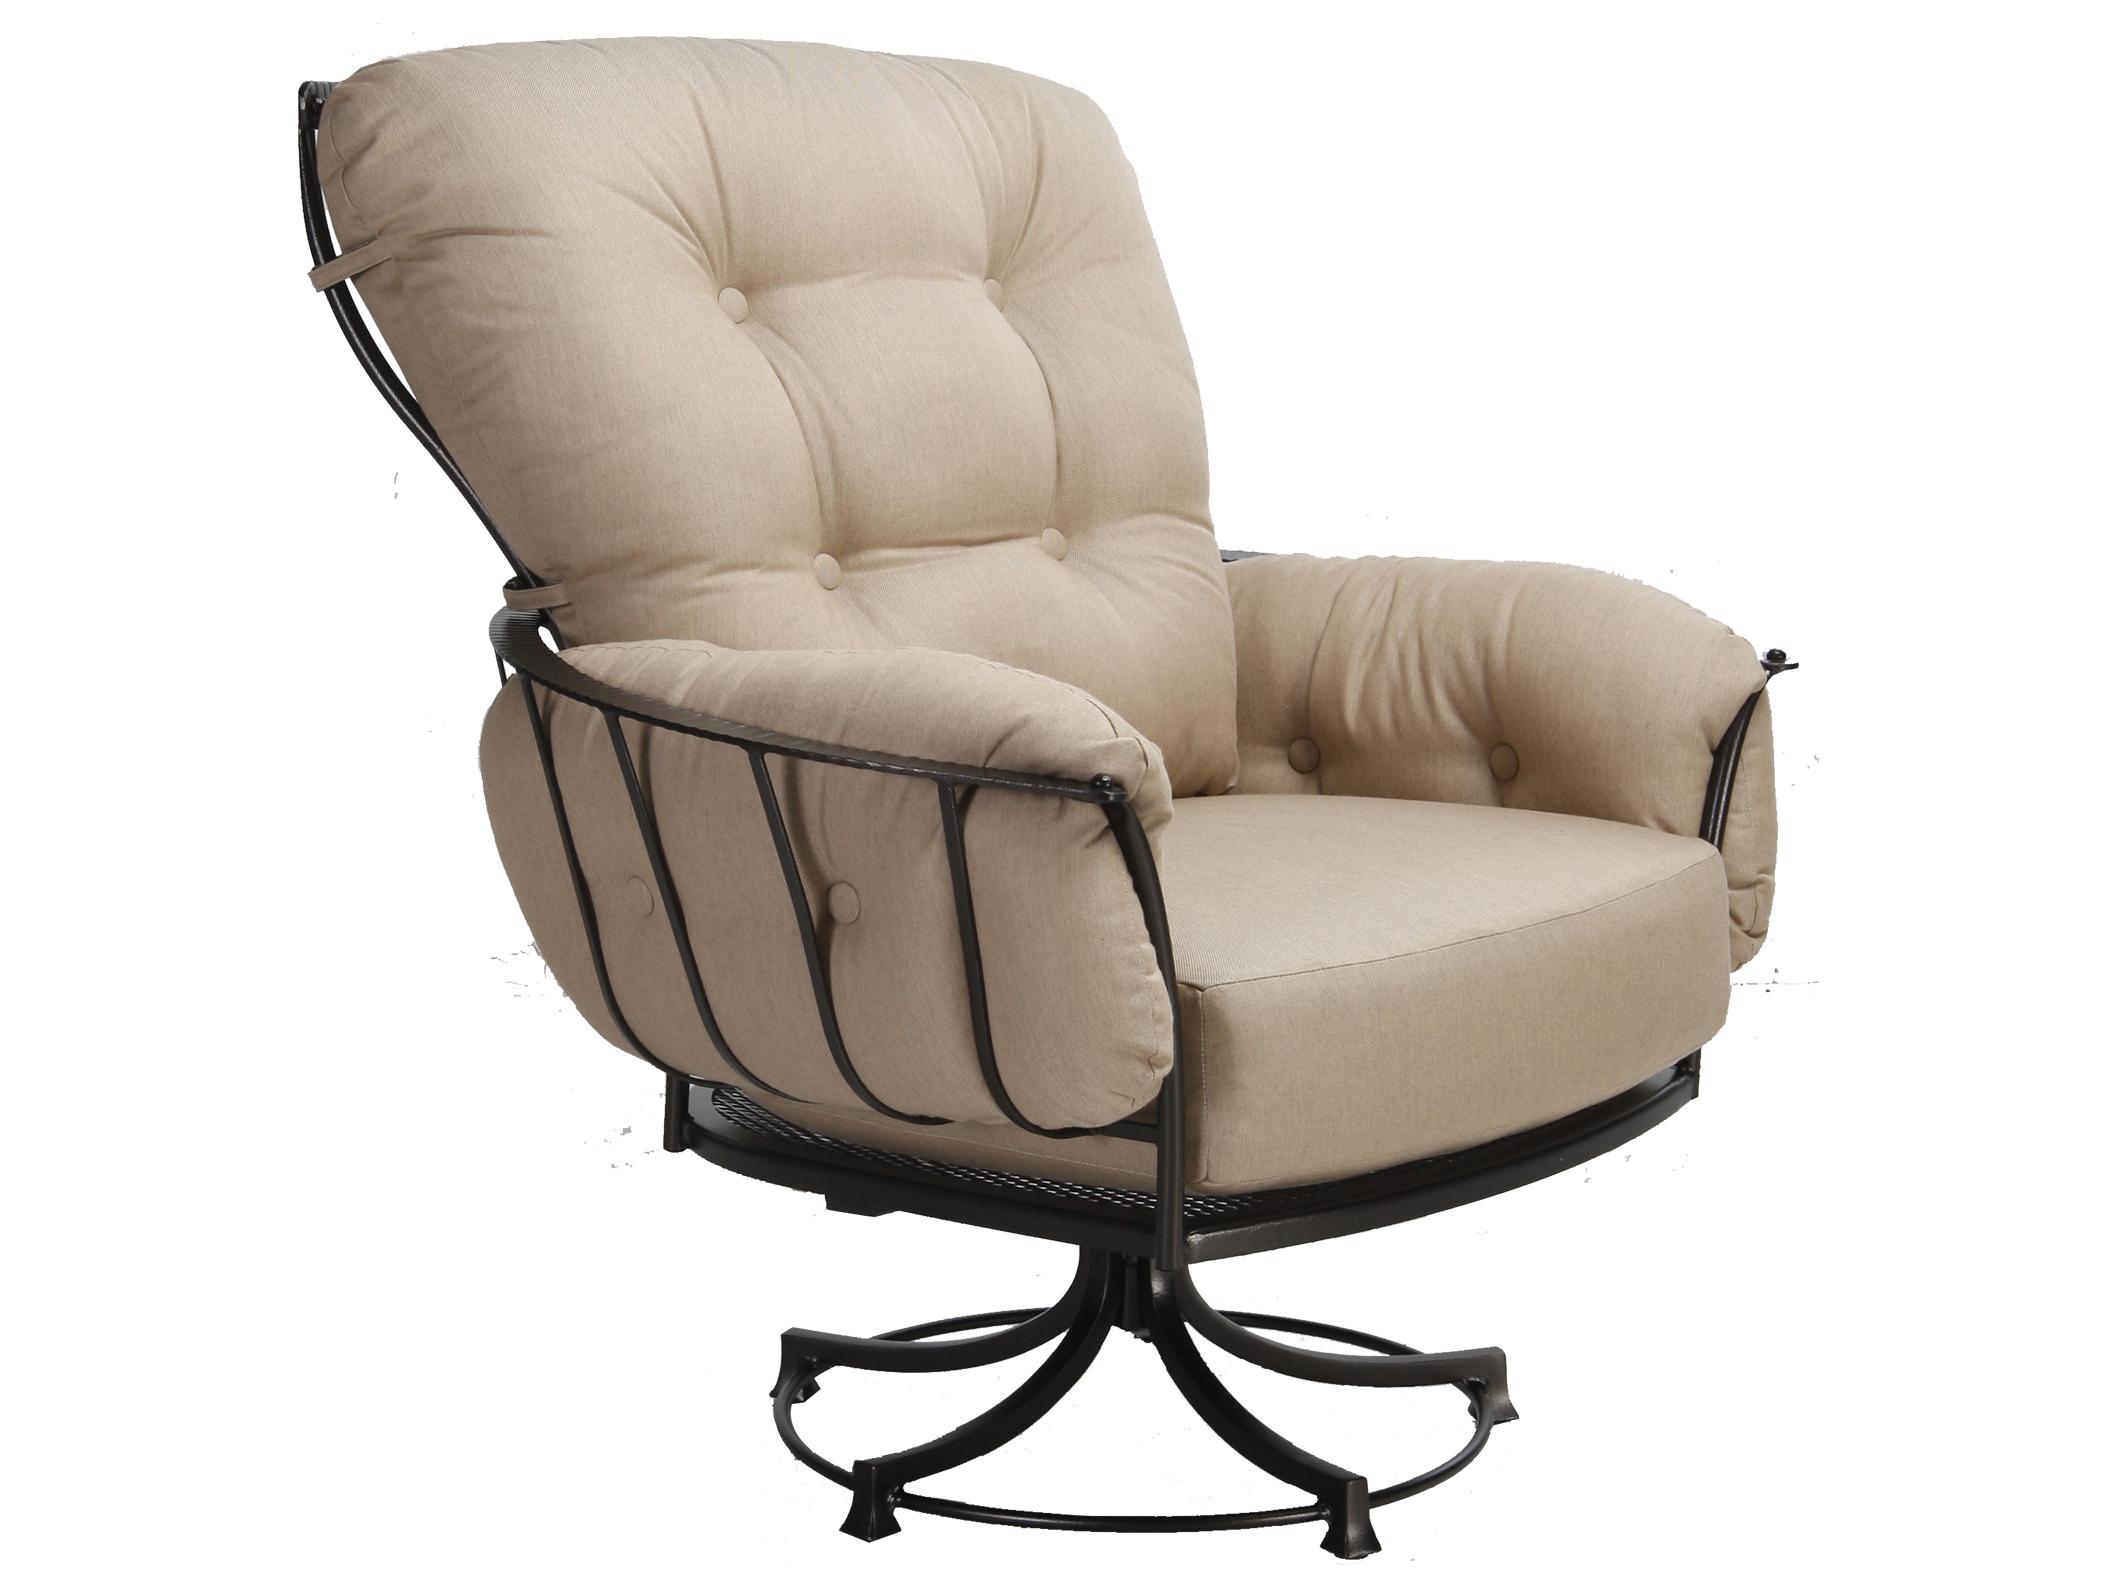 sailcloth beach chairs amazon uk wedding chair covers ow lee monterra wrought iron swivel rocker lounge